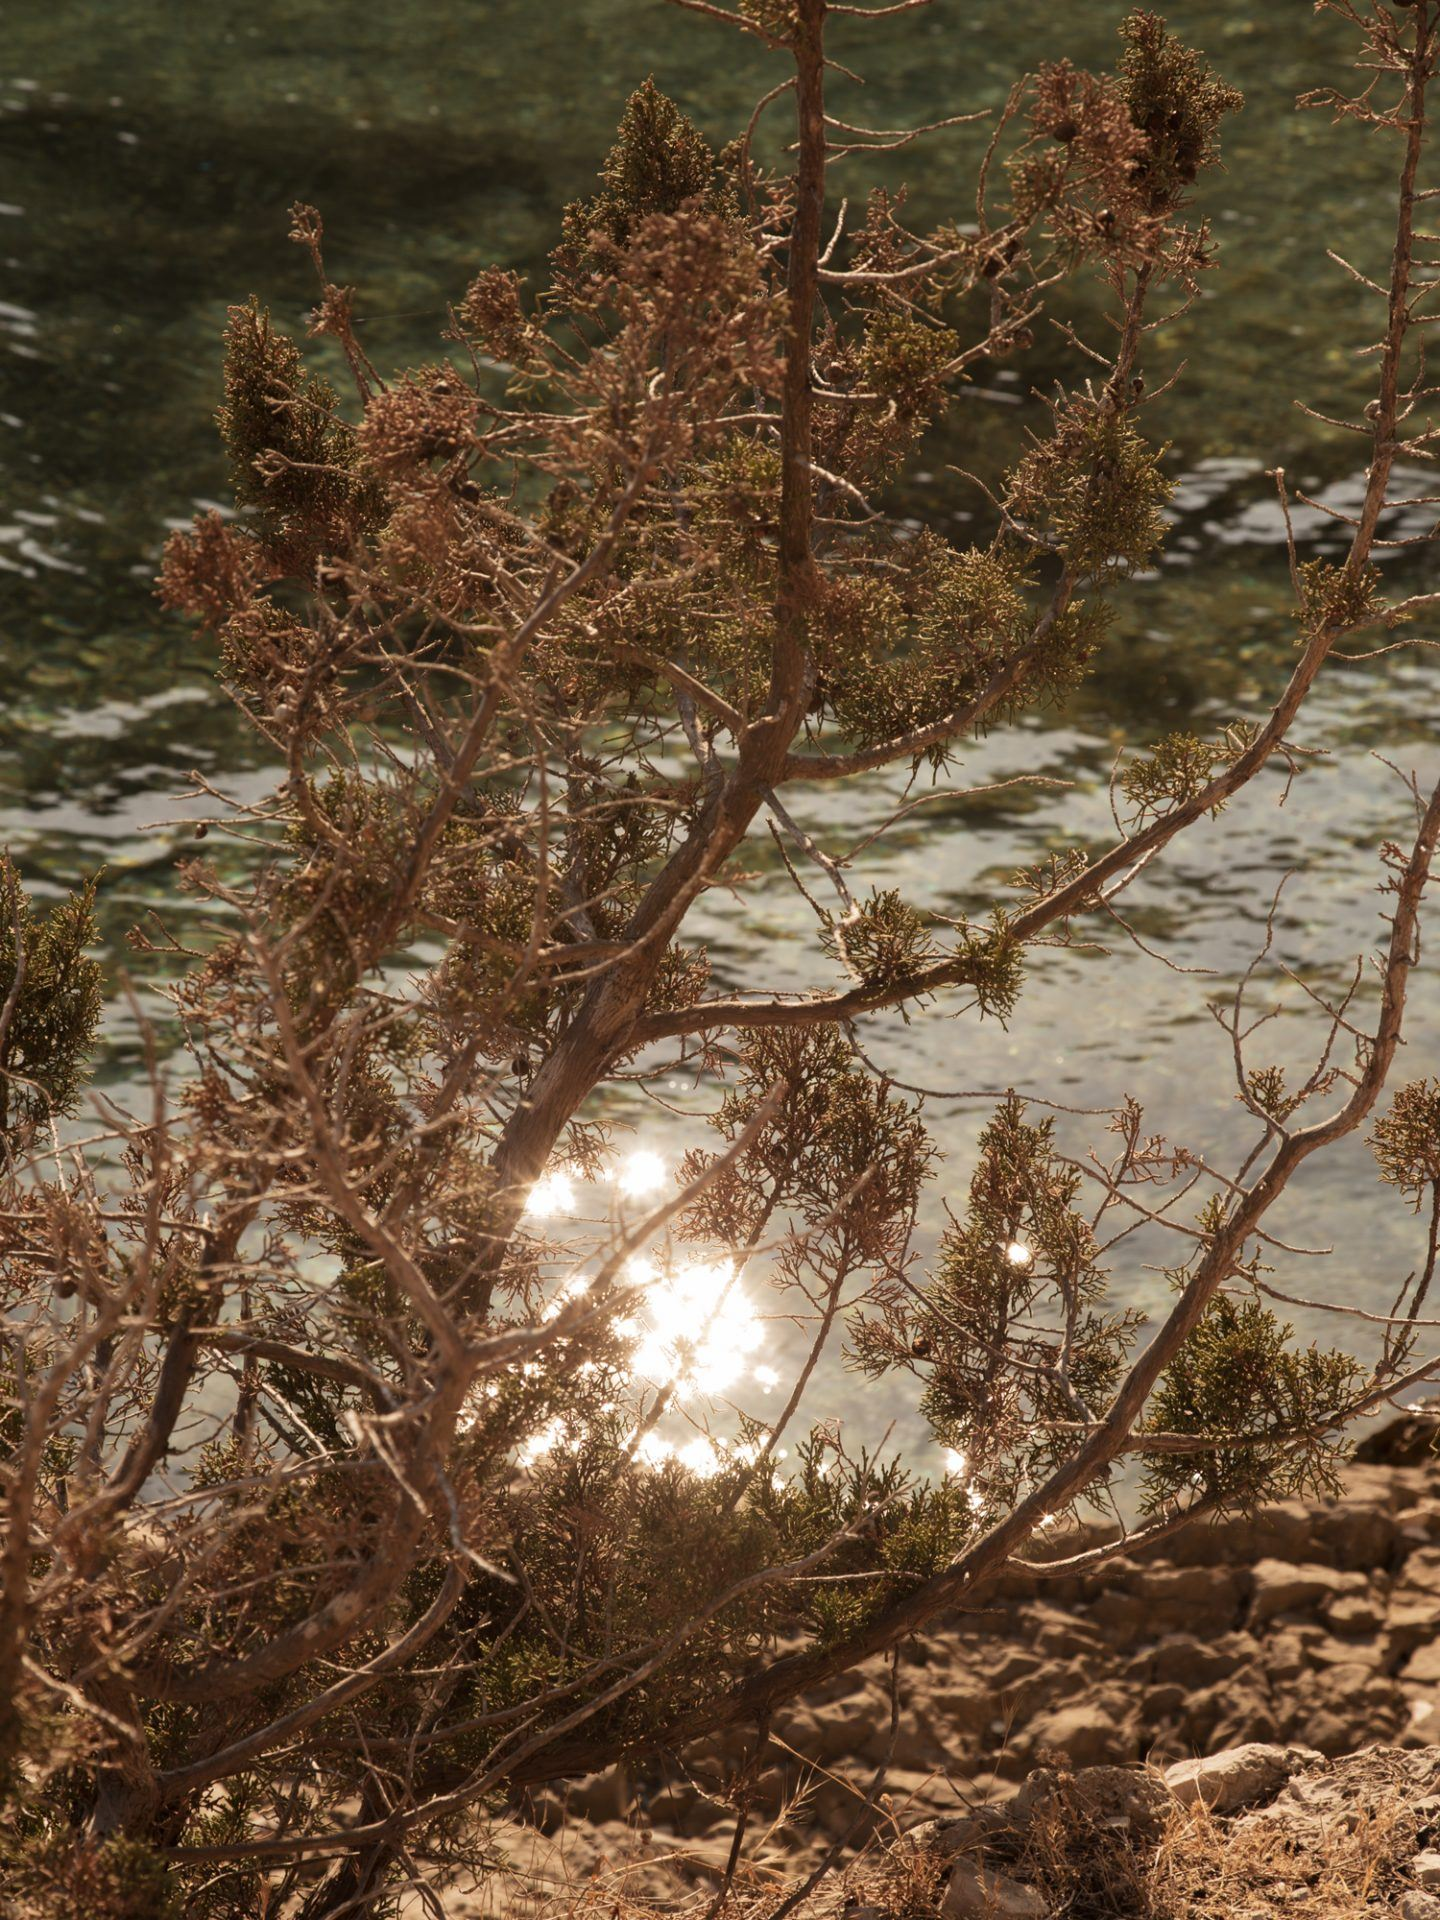 IGNANT-Photography-Anne-Sophie-Soudoplatoff-Songe-1